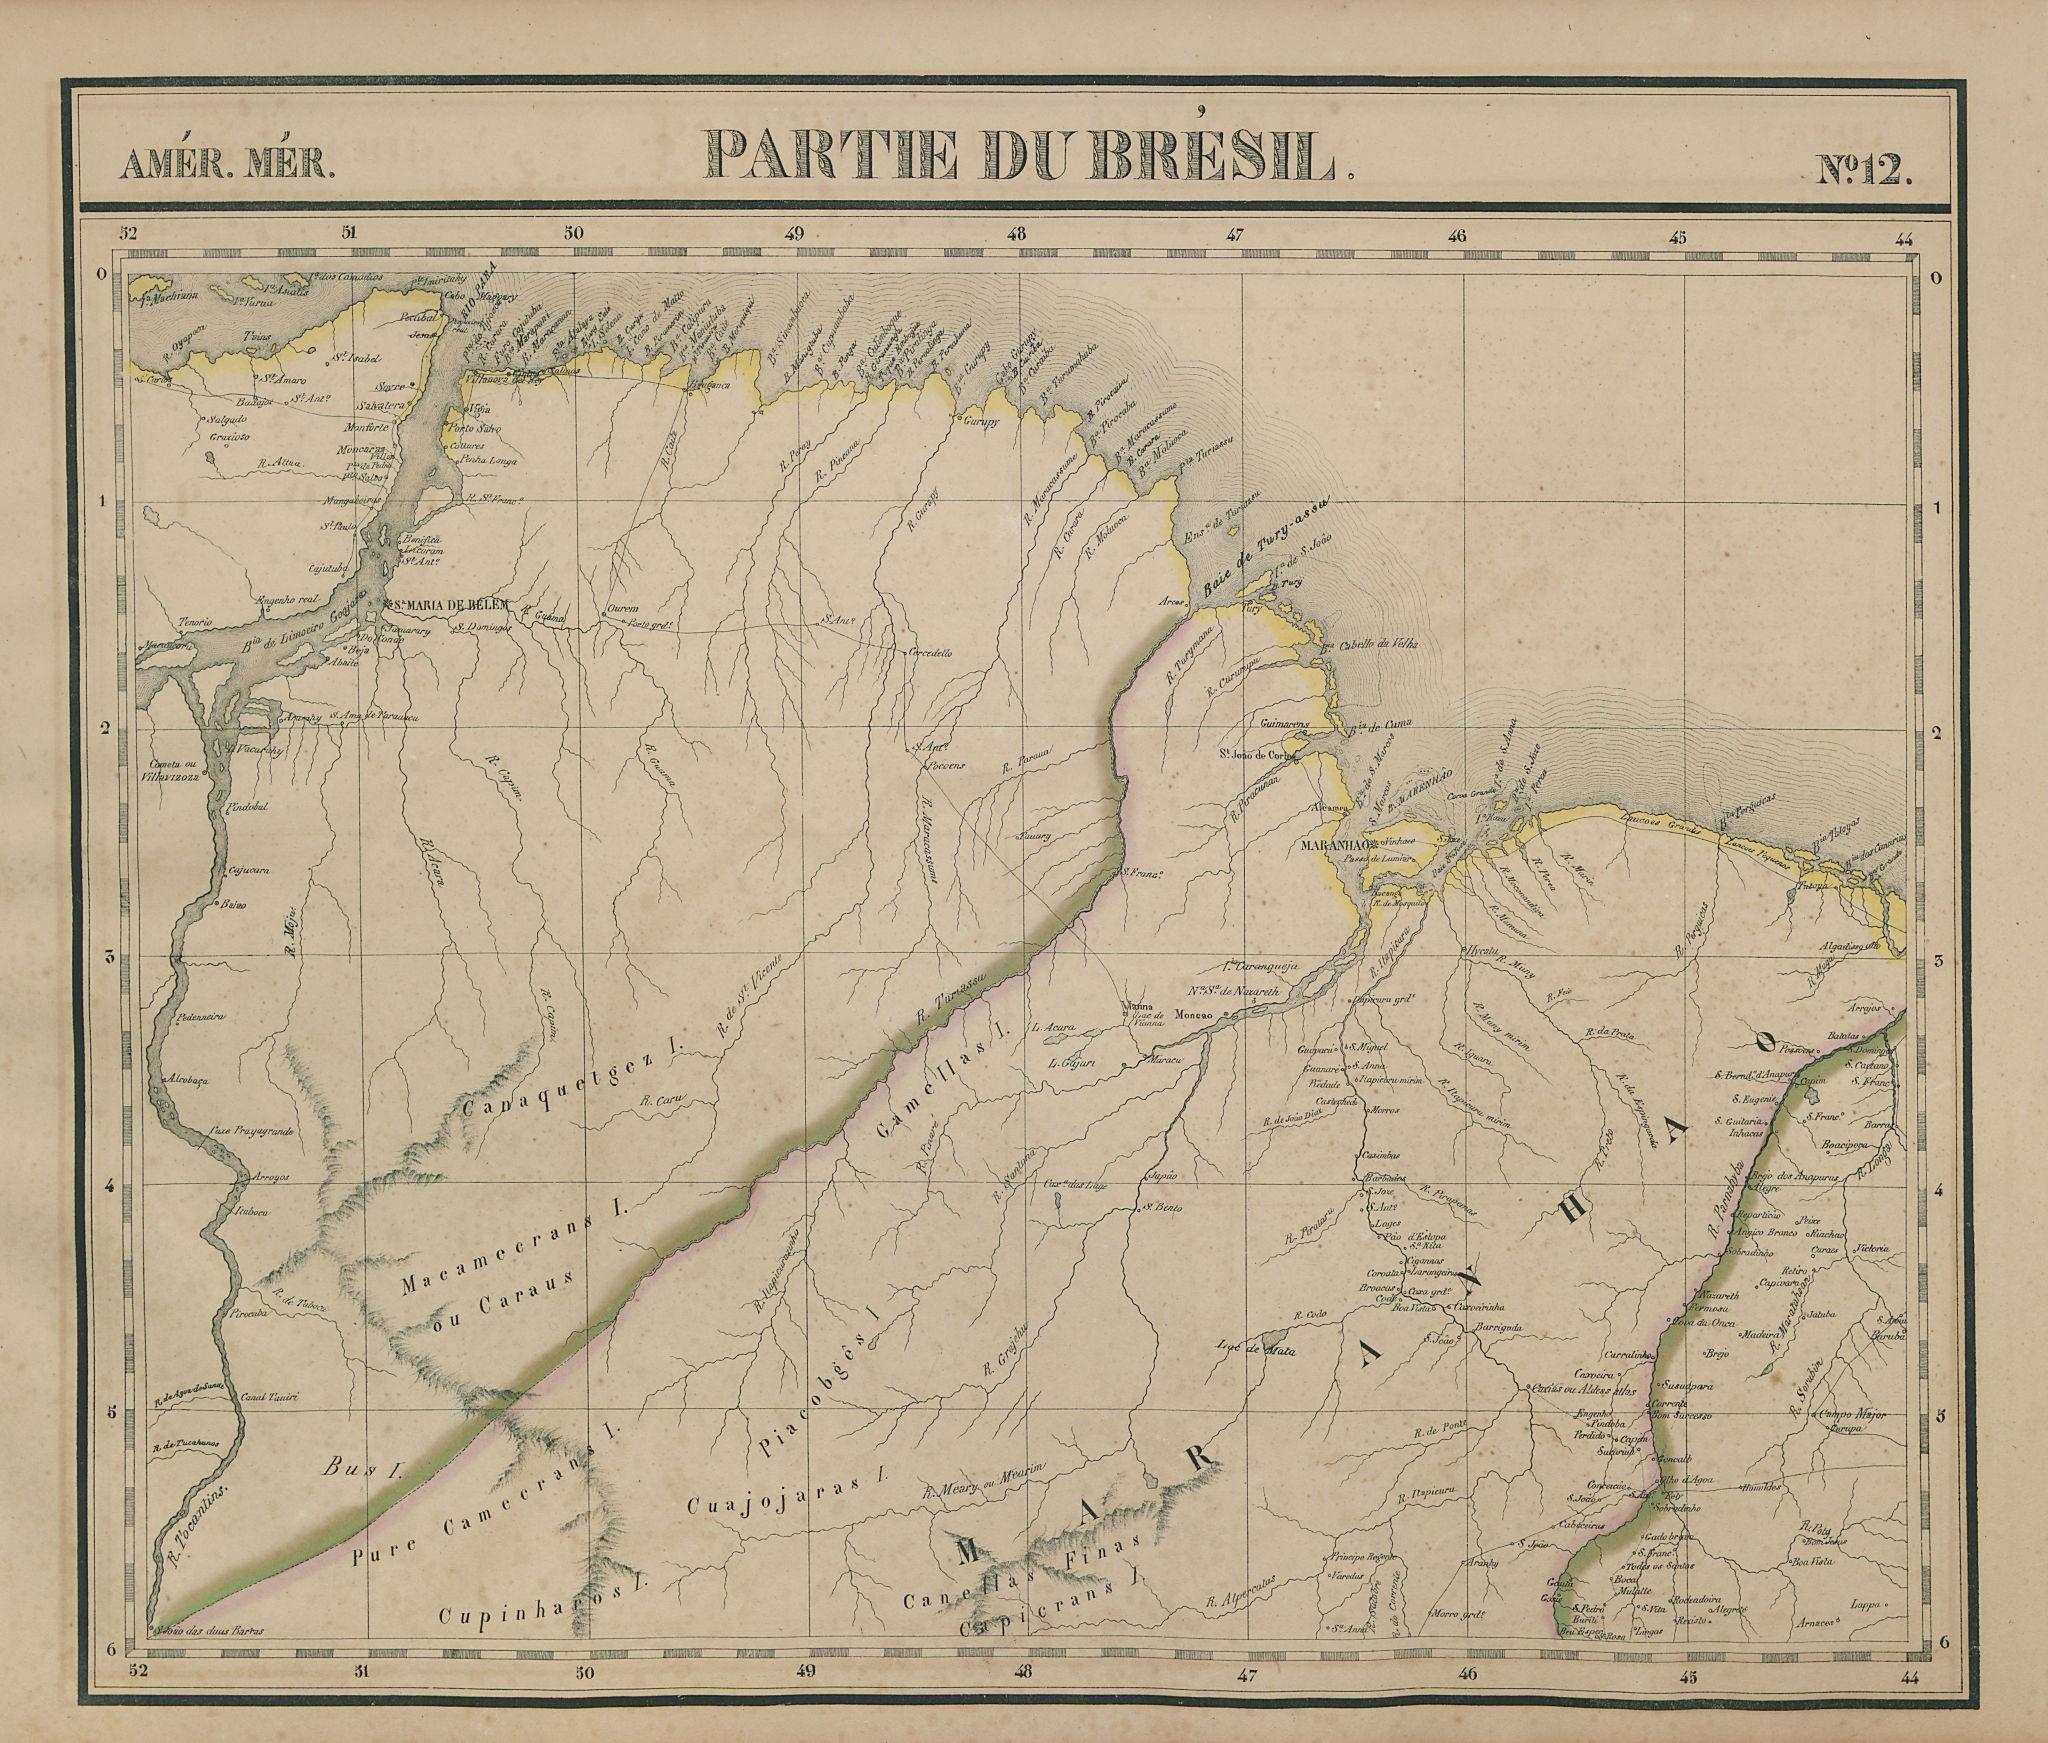 Amér. Mér. Brésil #12. NE Para & NW Maranhao, Brazil. VANDERMAELEN 1827 map